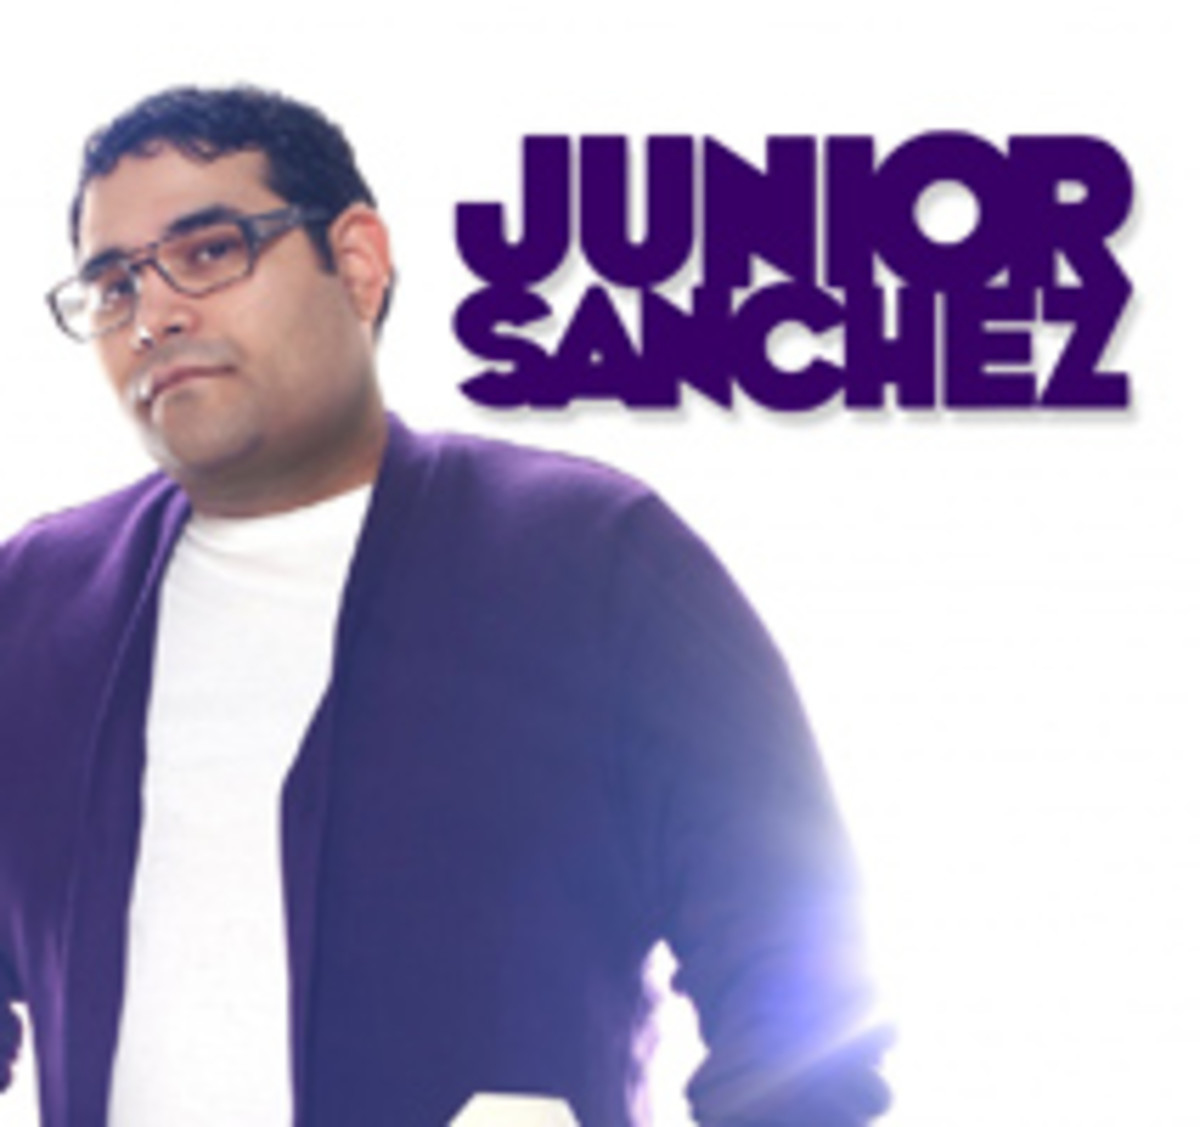 Junior-Sanchez-1024x962